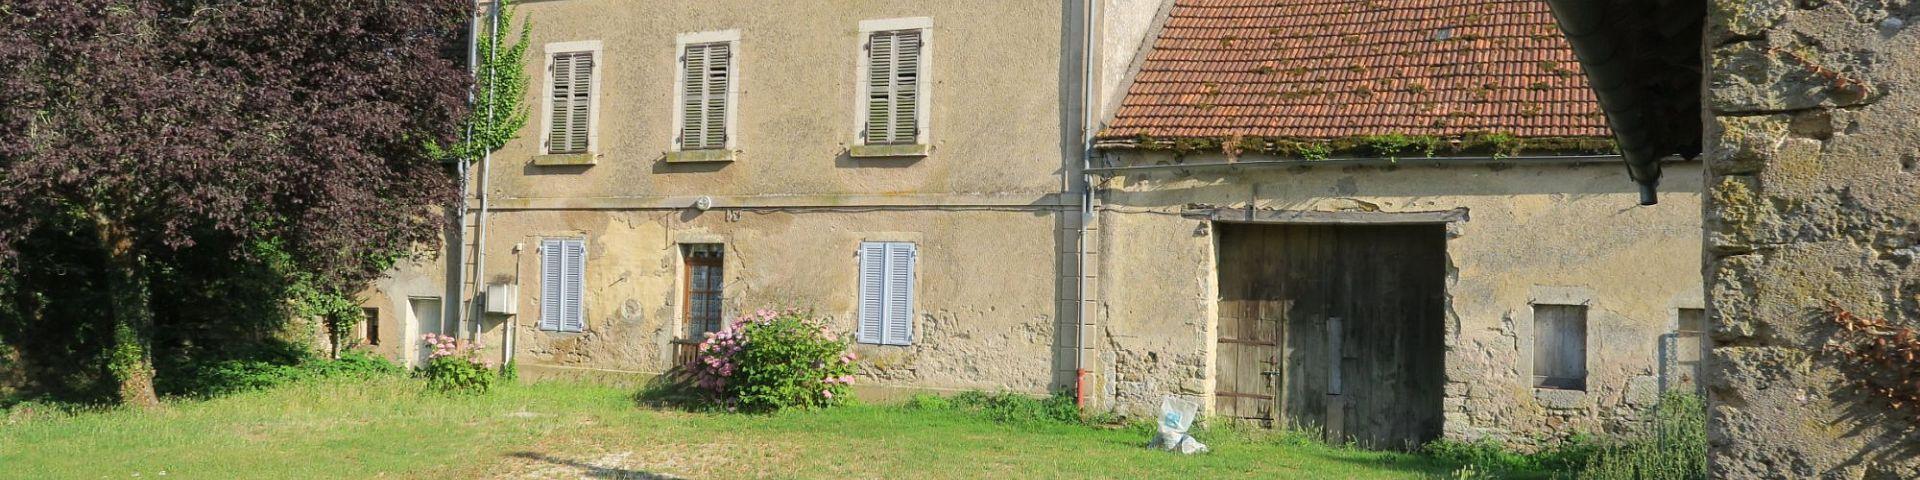 Lacour-d'Arcenay - Presbytère (21)